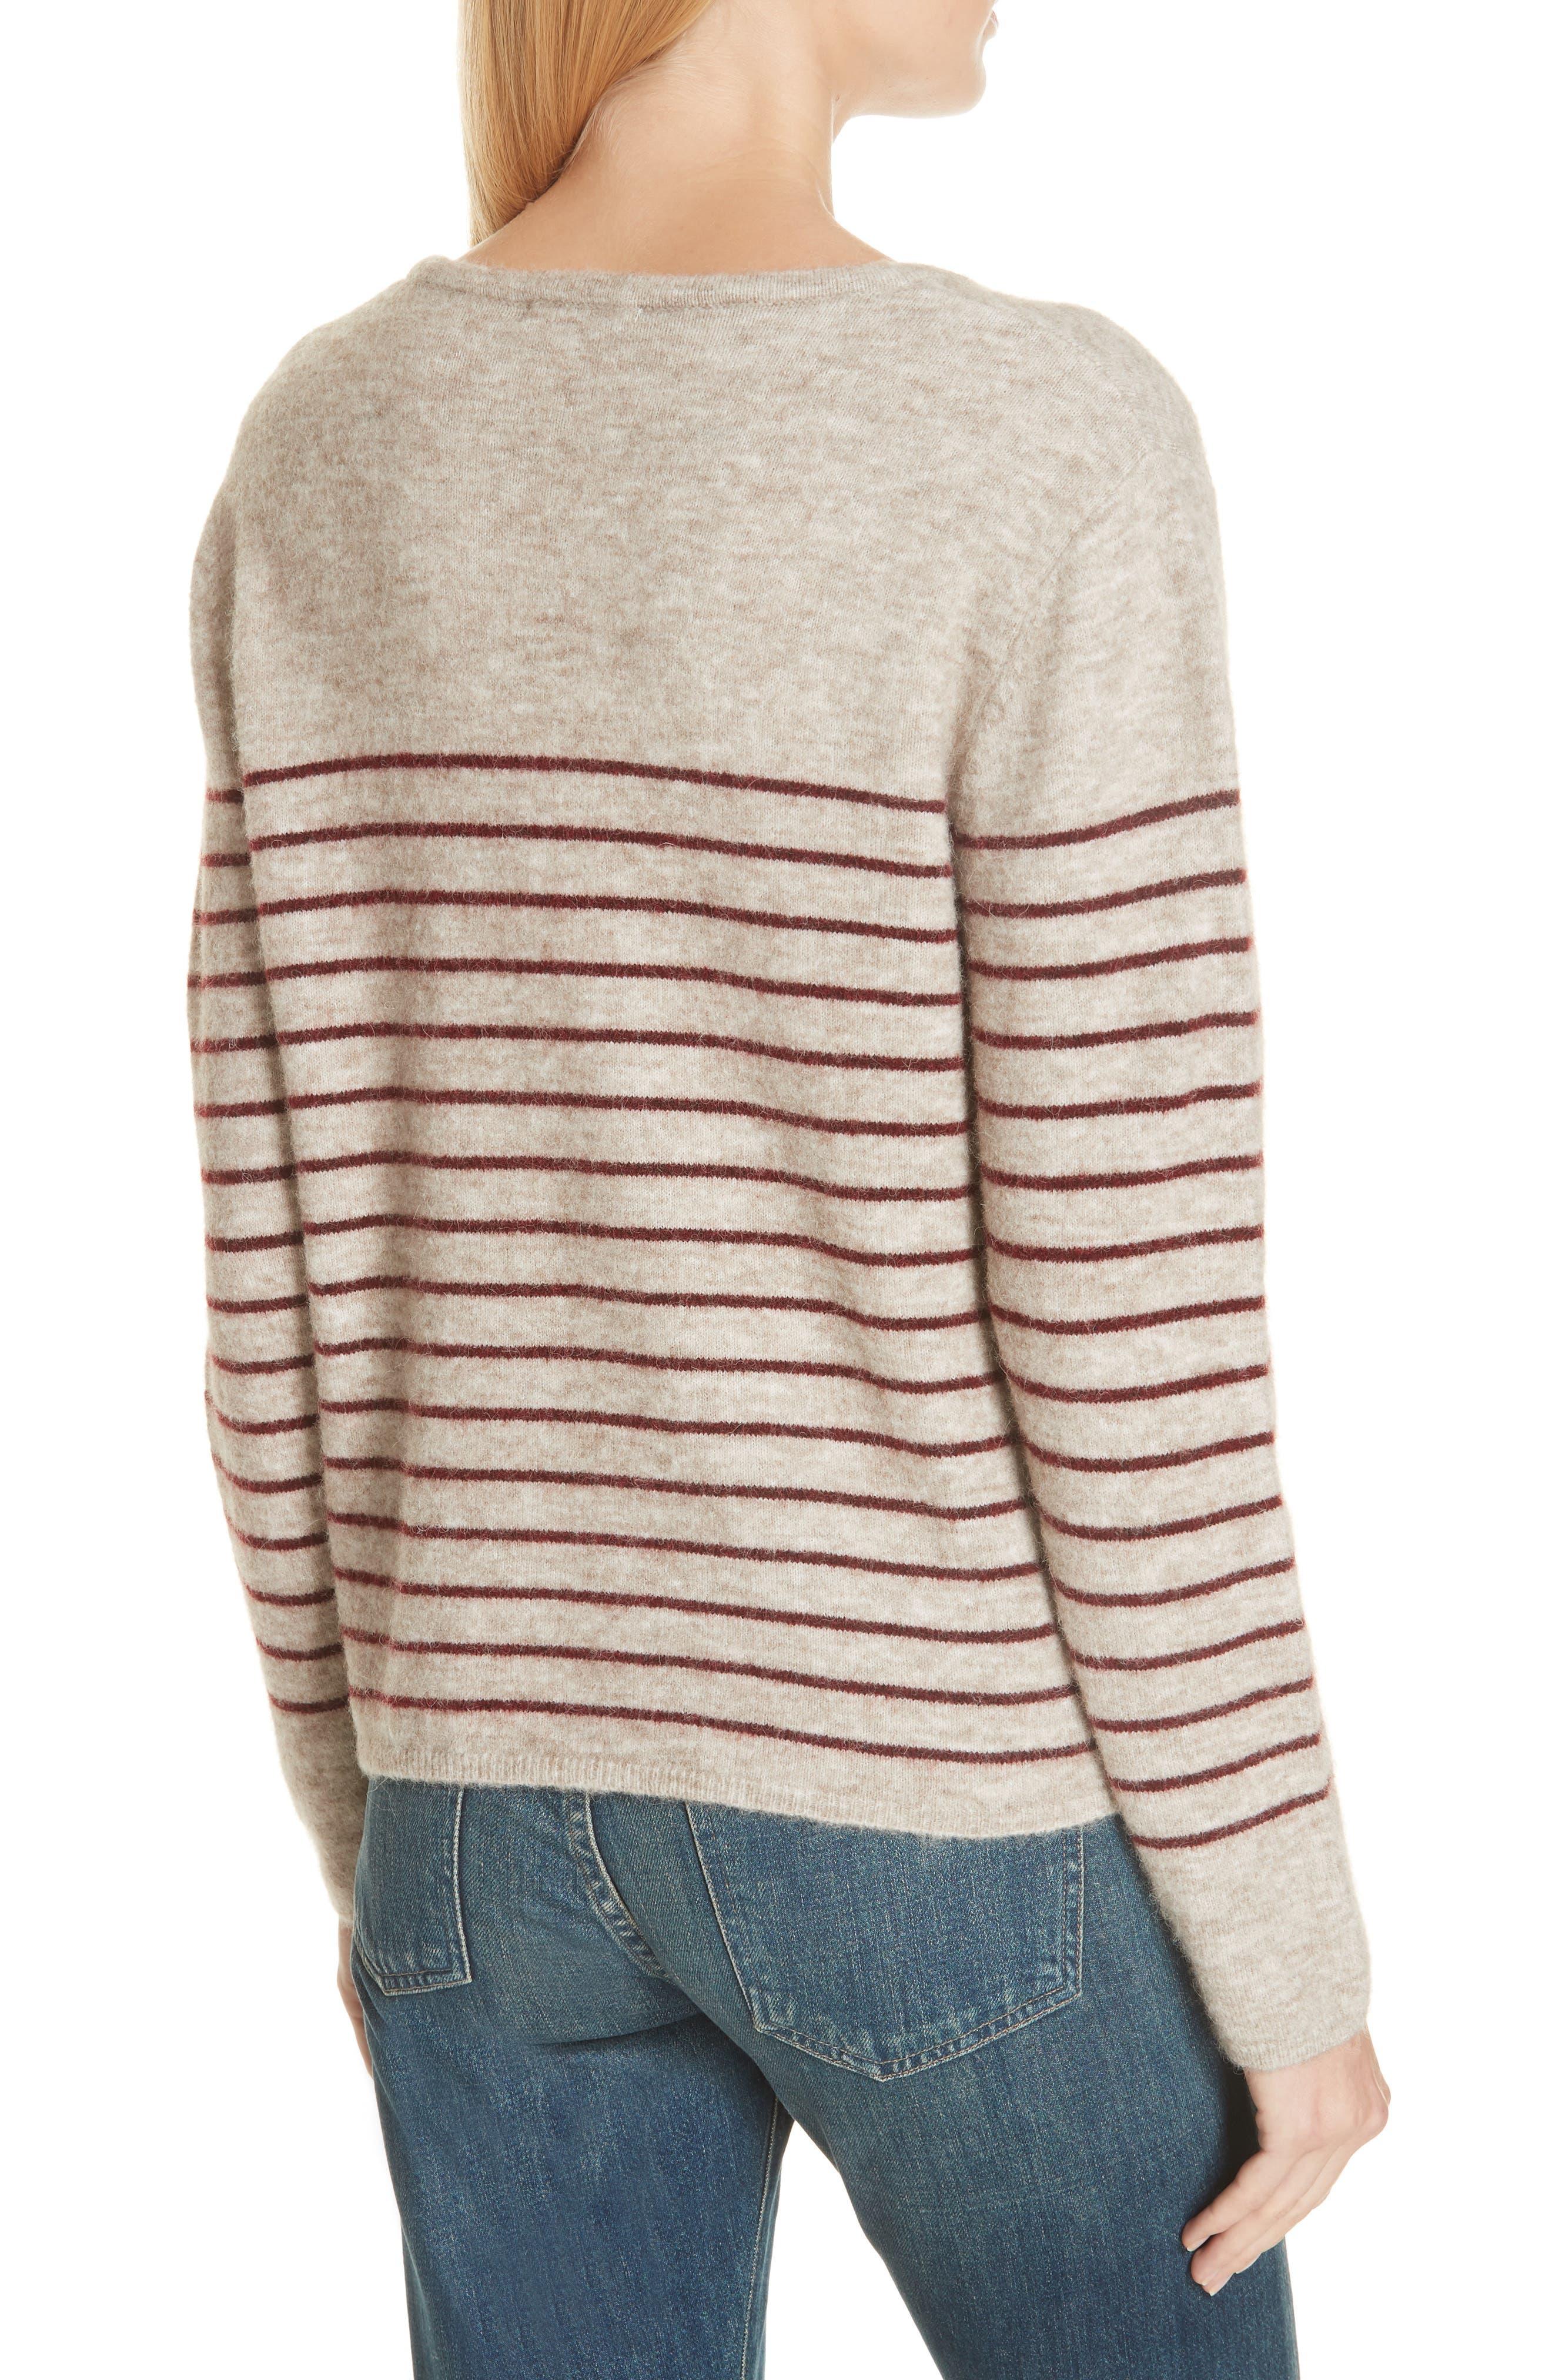 Artaud Stripe Sweater,                             Alternate thumbnail 2, color,                             BEIGE